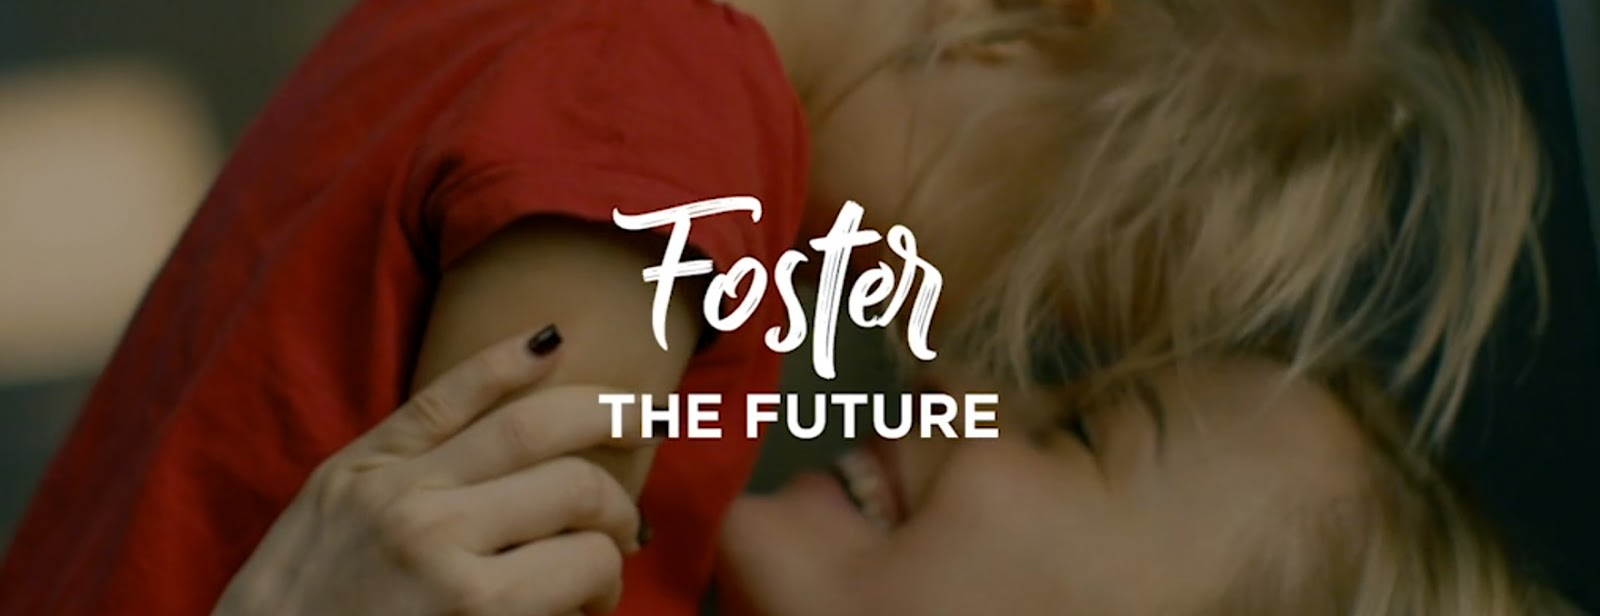 Foster the Future - Government Marketing